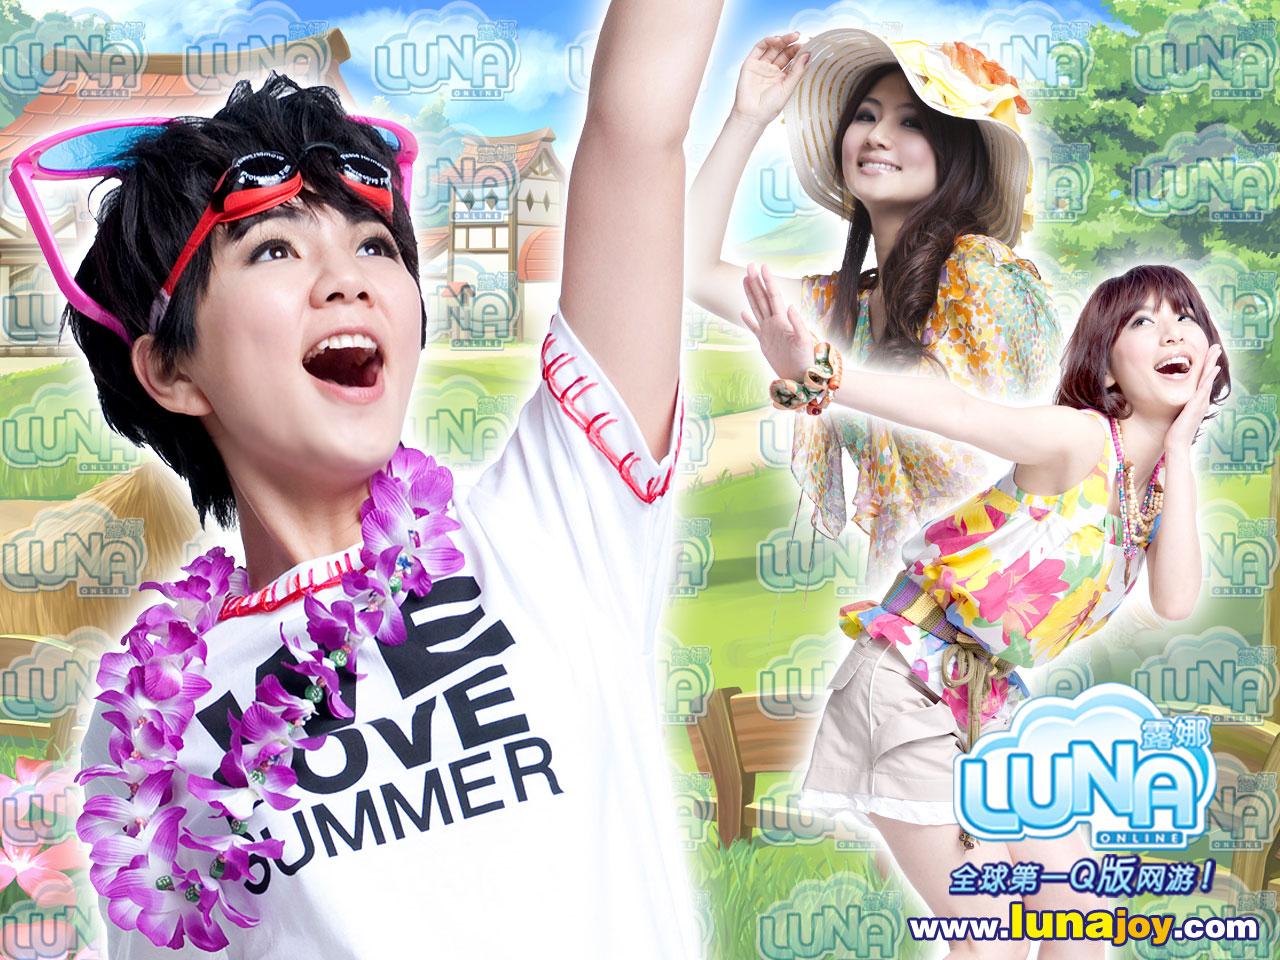 http://3.bp.blogspot.com/_H9yKkHiZ4mc/S-EylyTQTiI/AAAAAAAADeA/Z19hMUuCdws/s1600/taiwan-she-023b.jpg